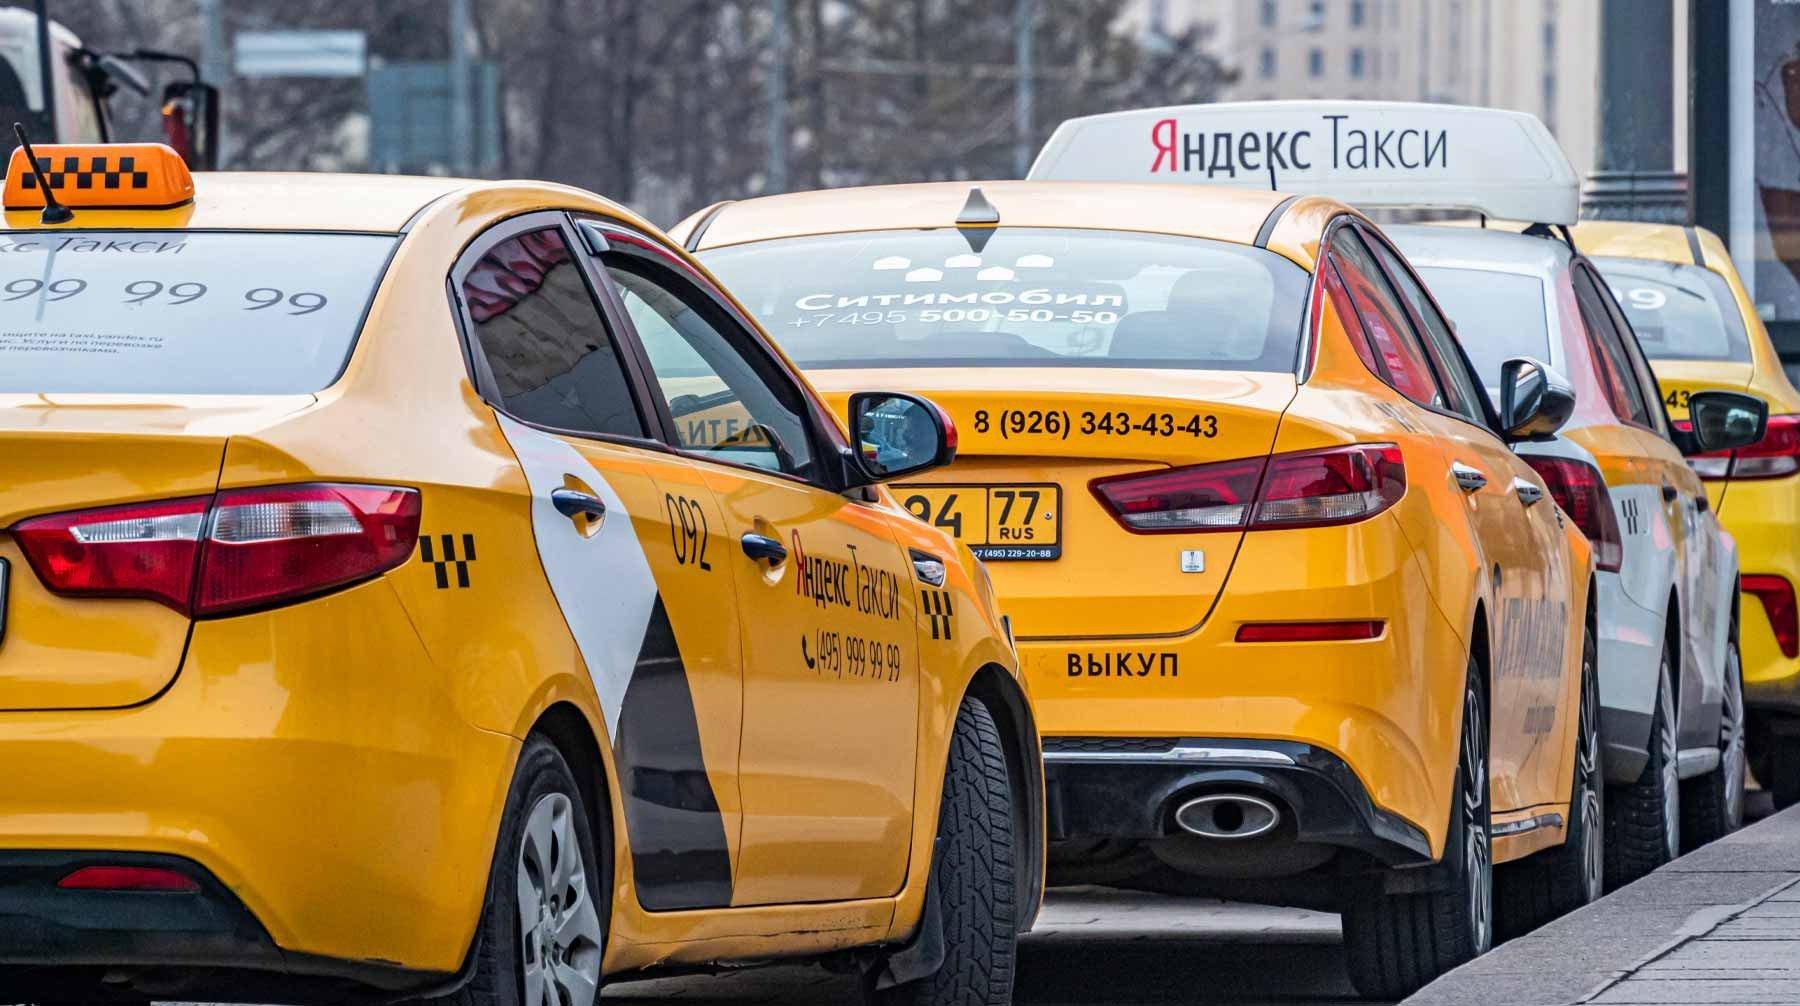 Департамент транспорта опубликовал статистику ДТП с таксистами